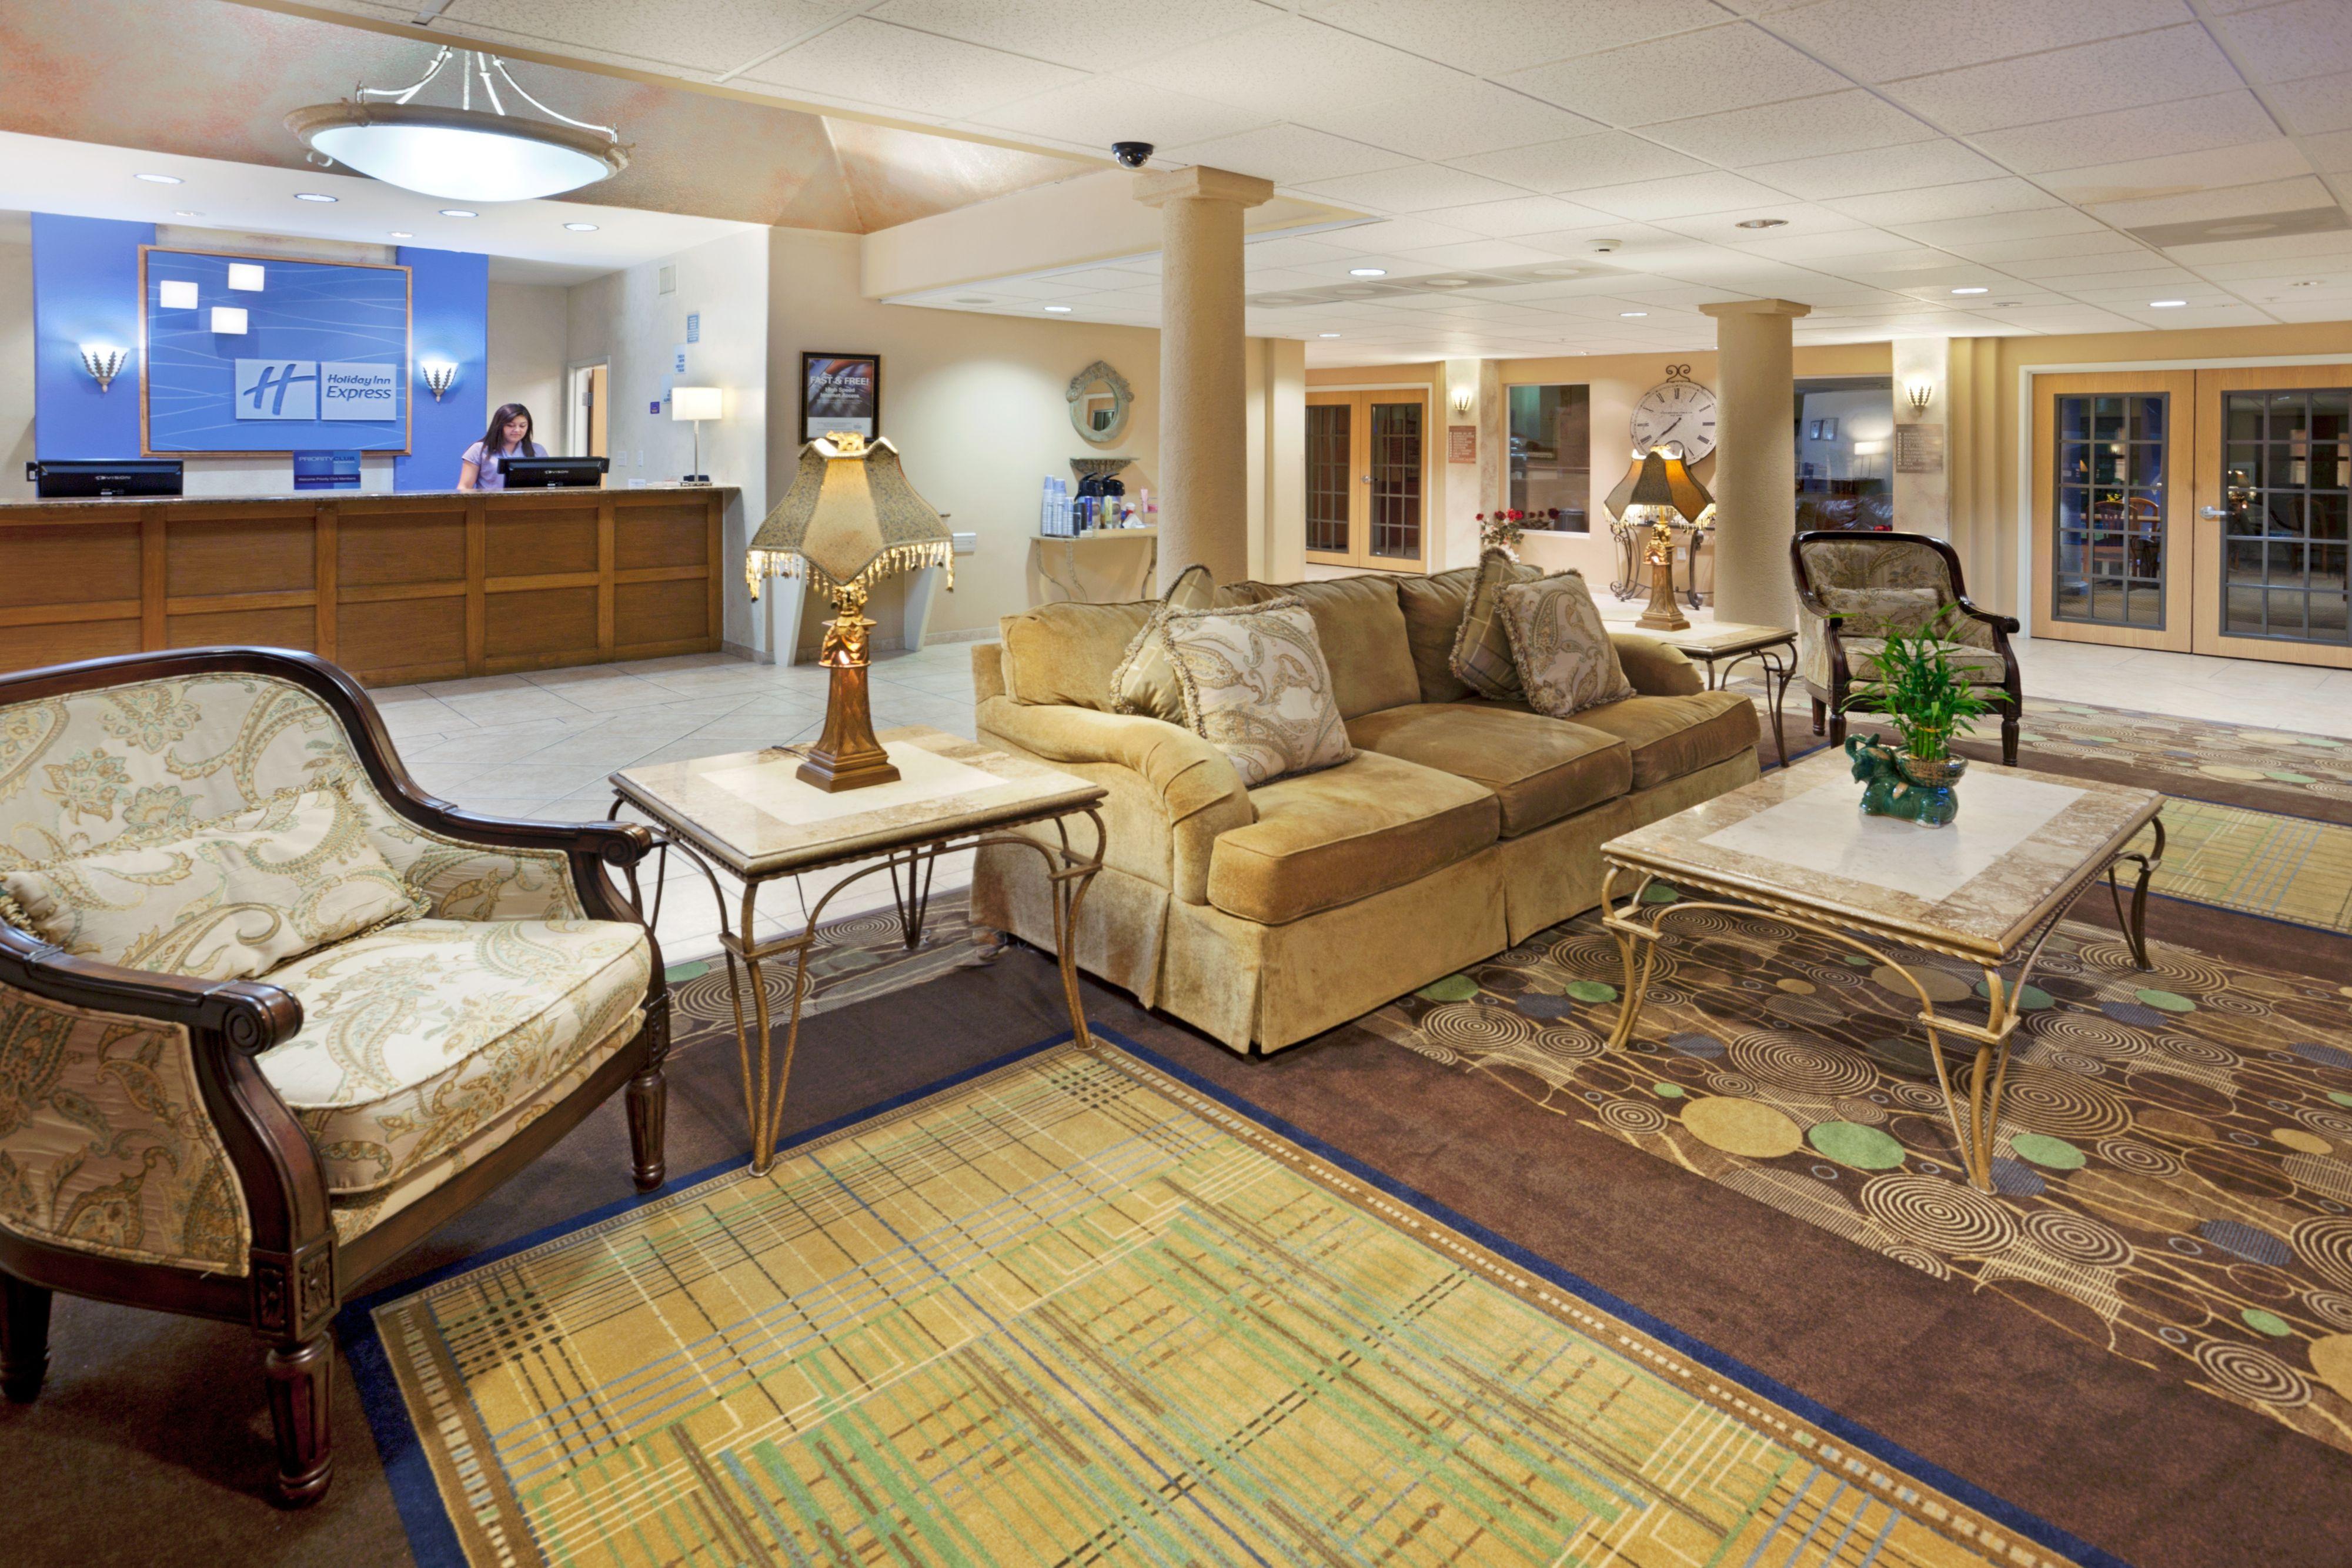 Holiday Inn Express & Suites Elgin image 5